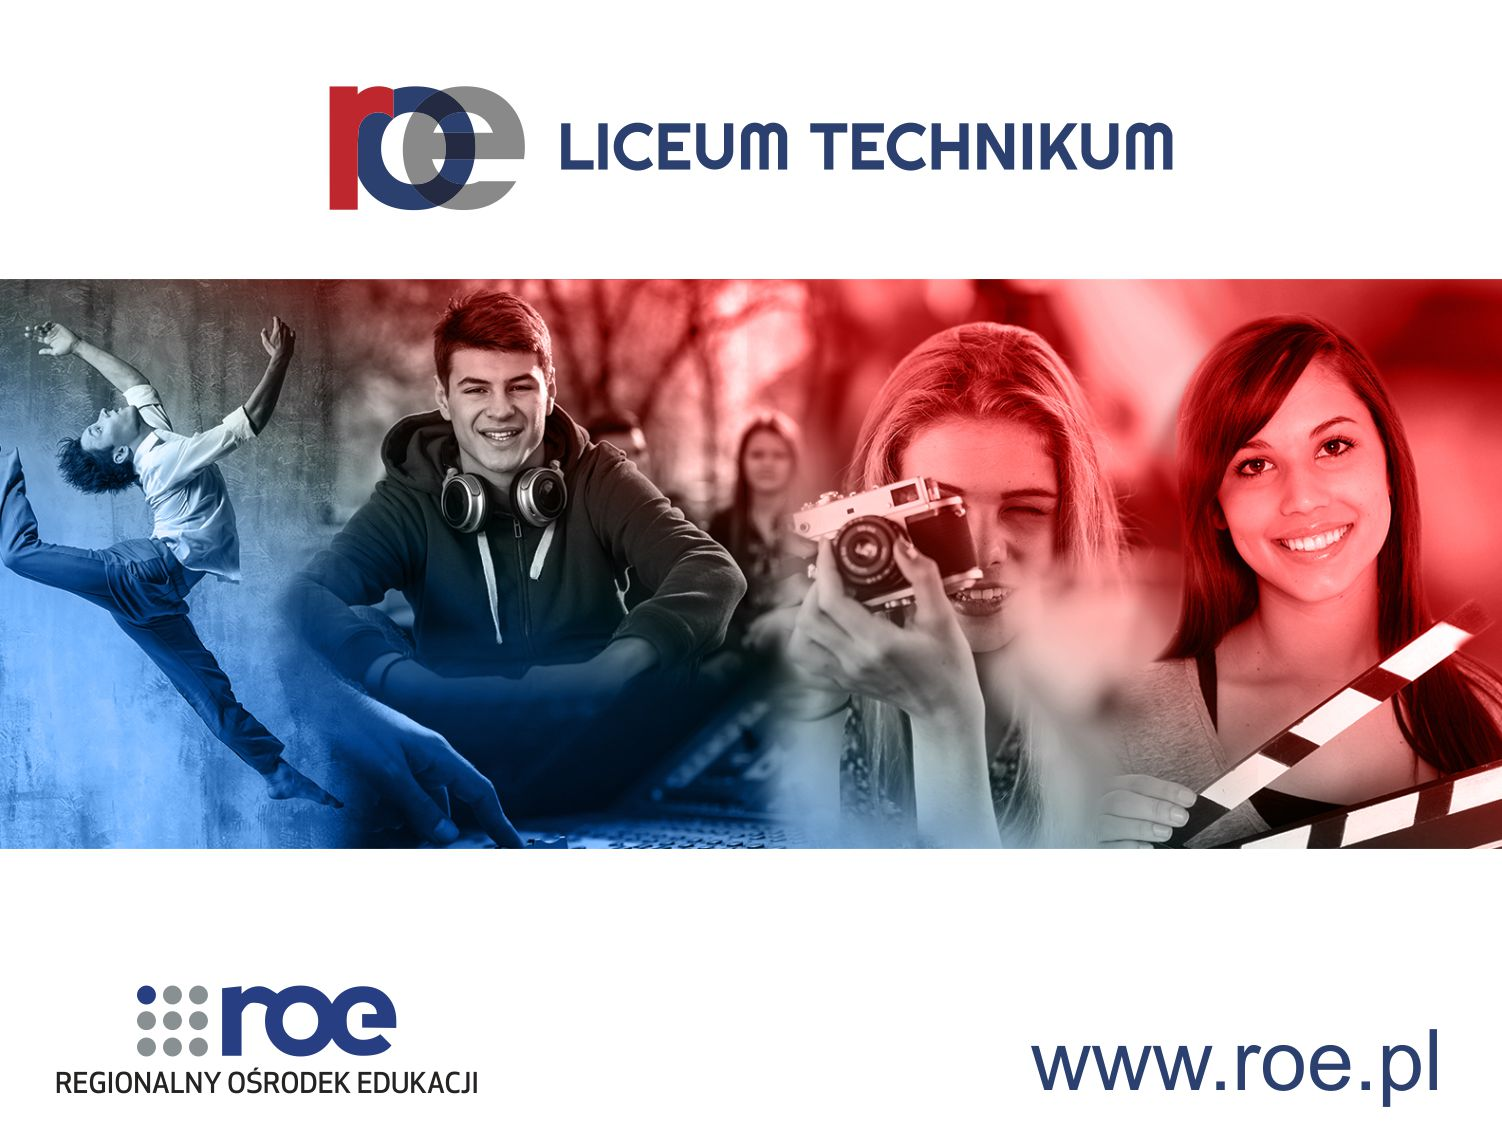 Liceum i Technikum ROE motyw